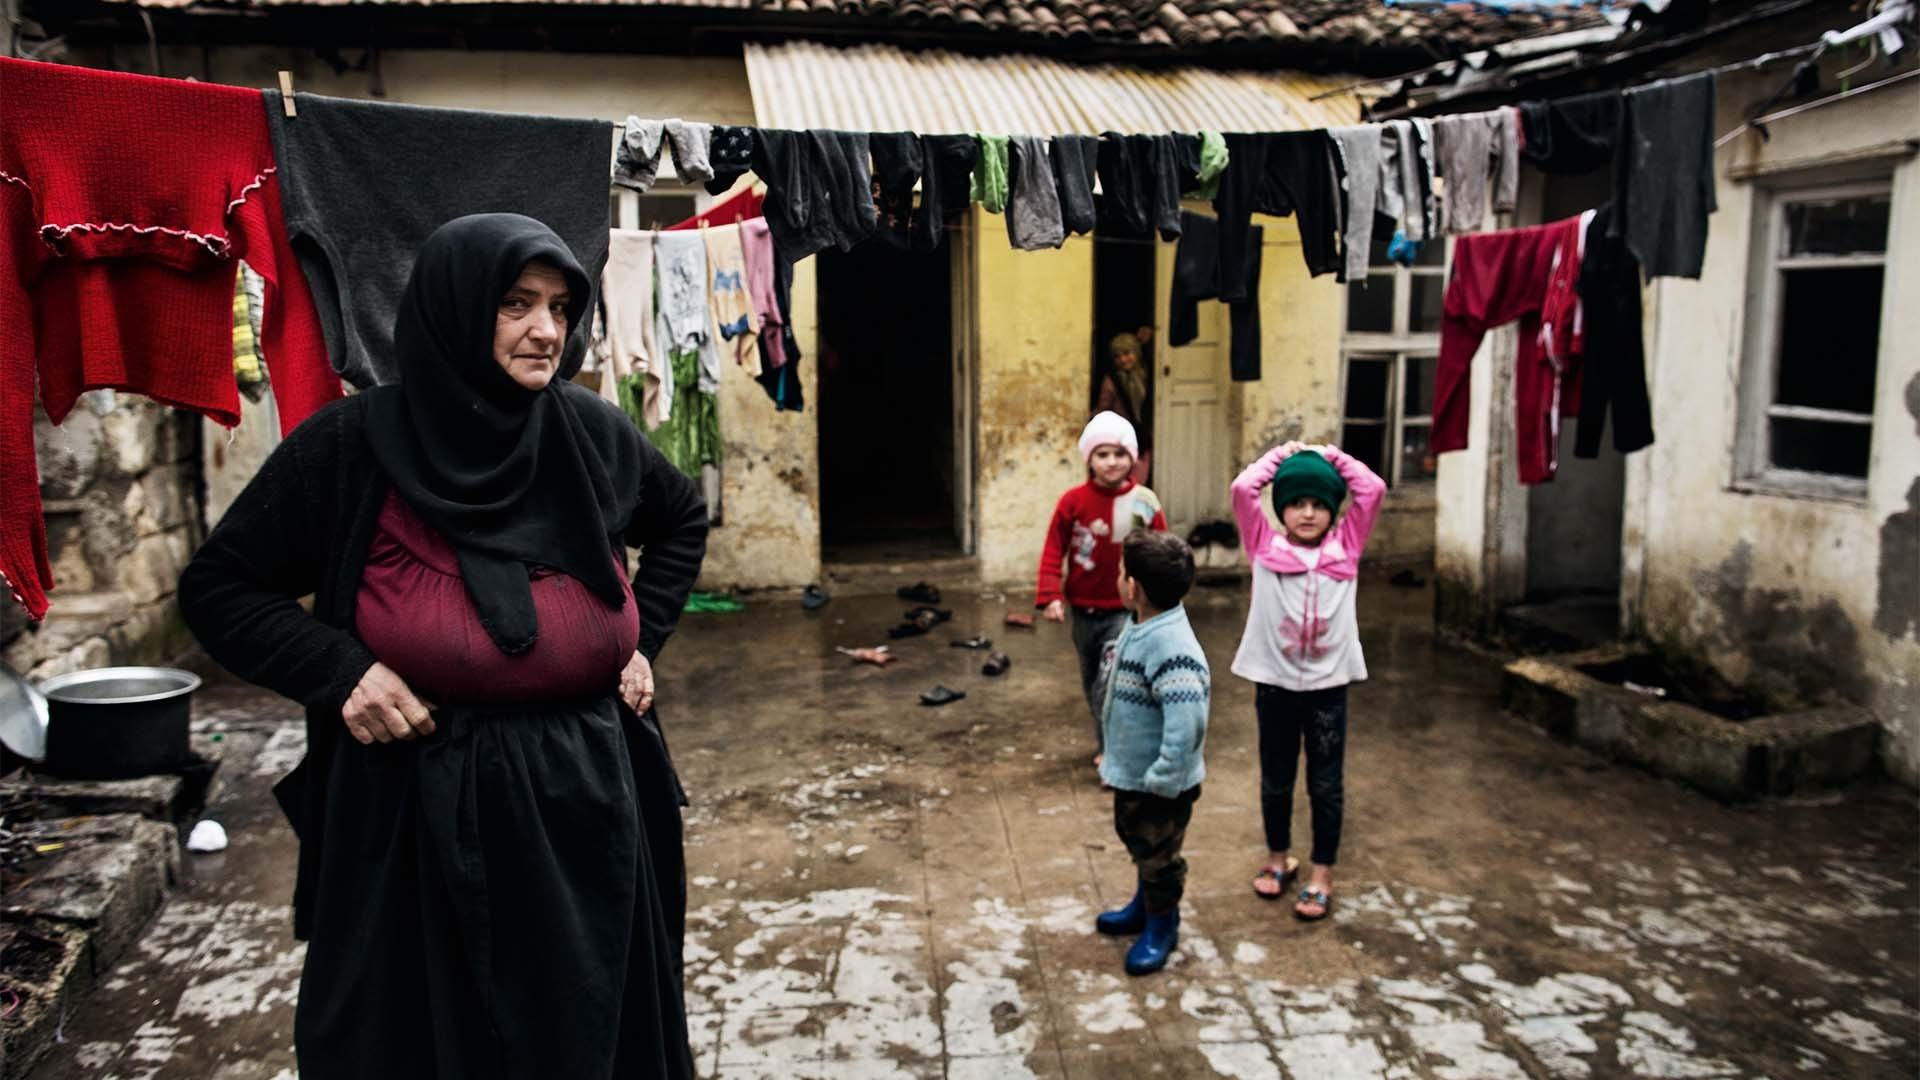 March 17, 2014, Gaziantep, Turkey